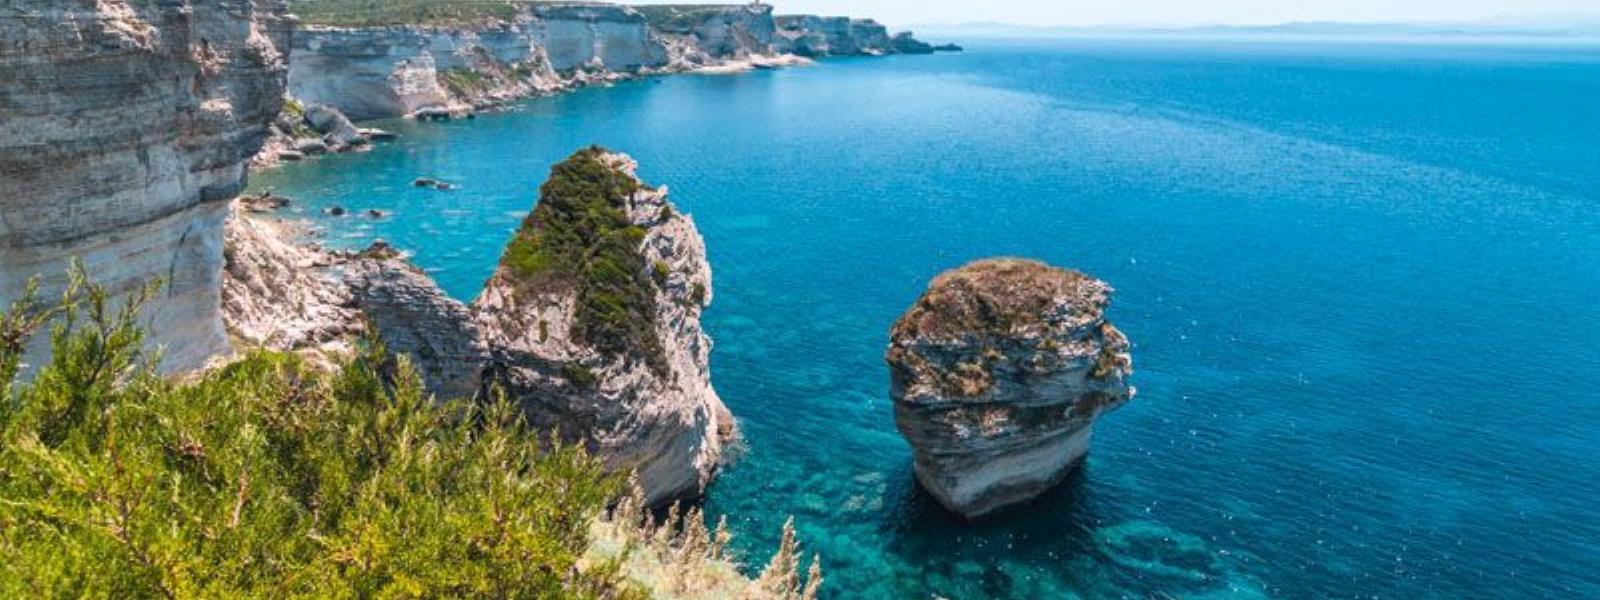 2017 - La Corse Travel - Le Grain de sable